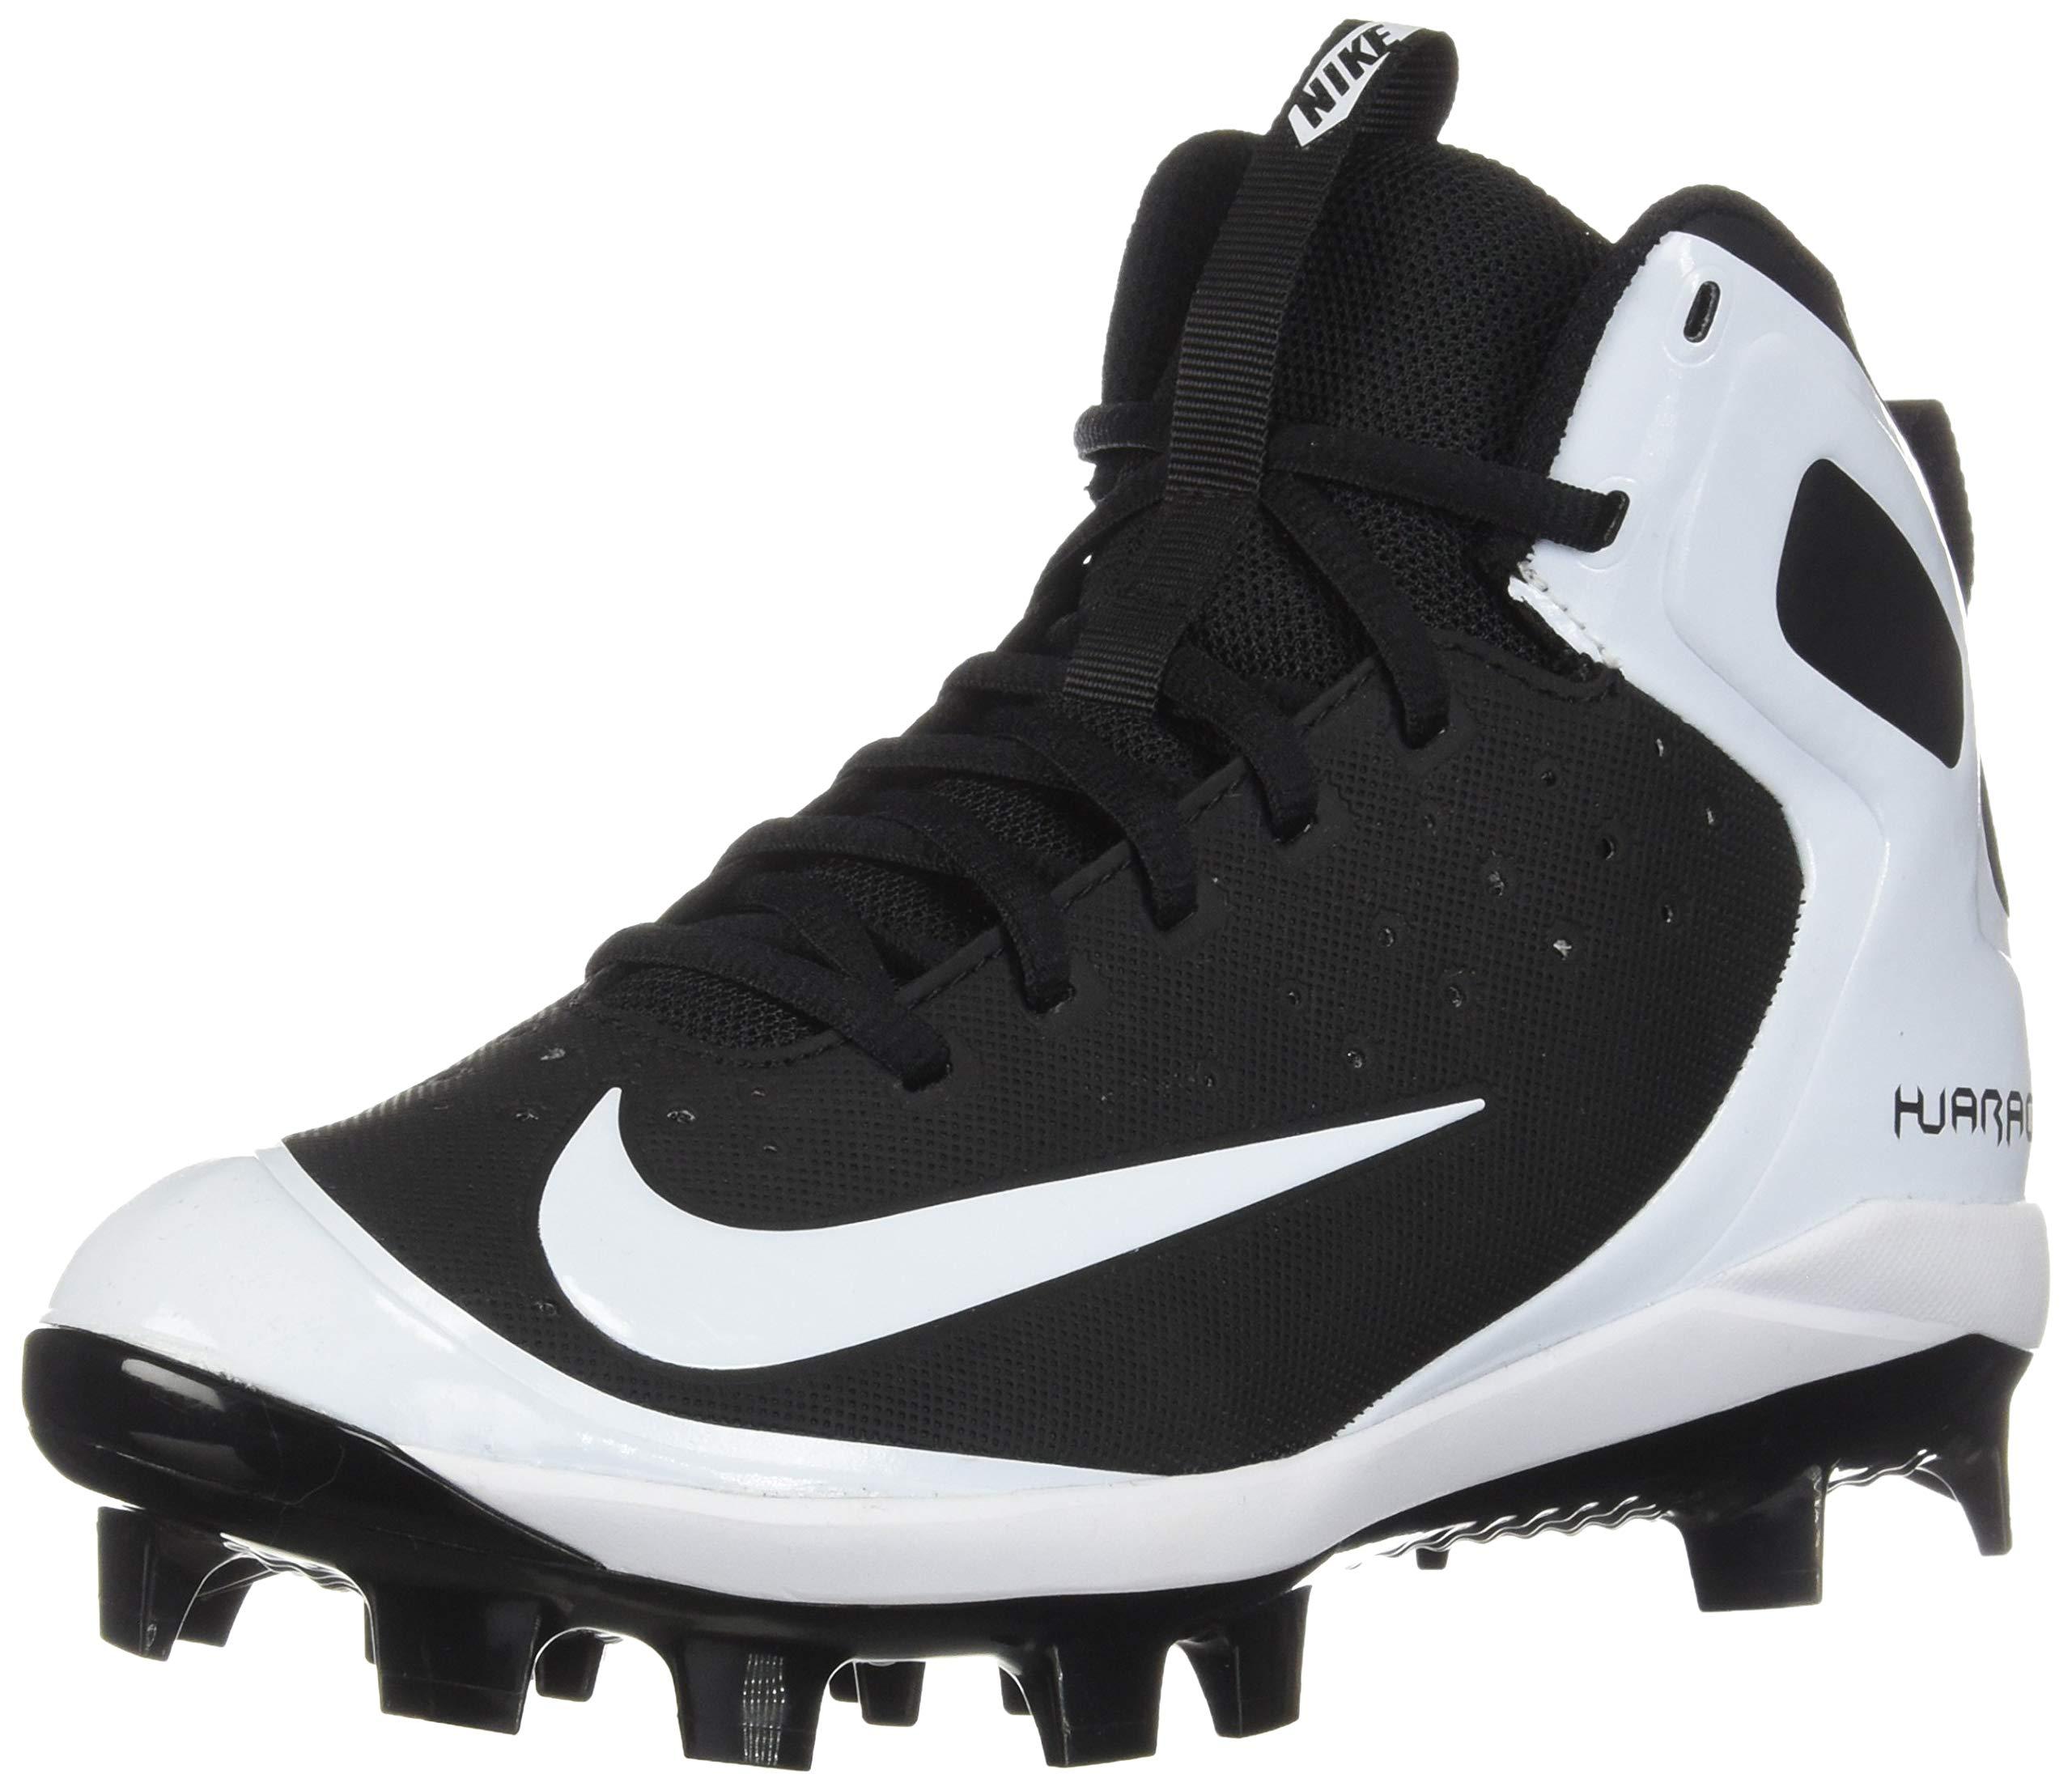 Nike Kids' Alpha Huarache Pro Mid Baseball Cleats(Black/White, 2.5 Little Kid M) by Nike